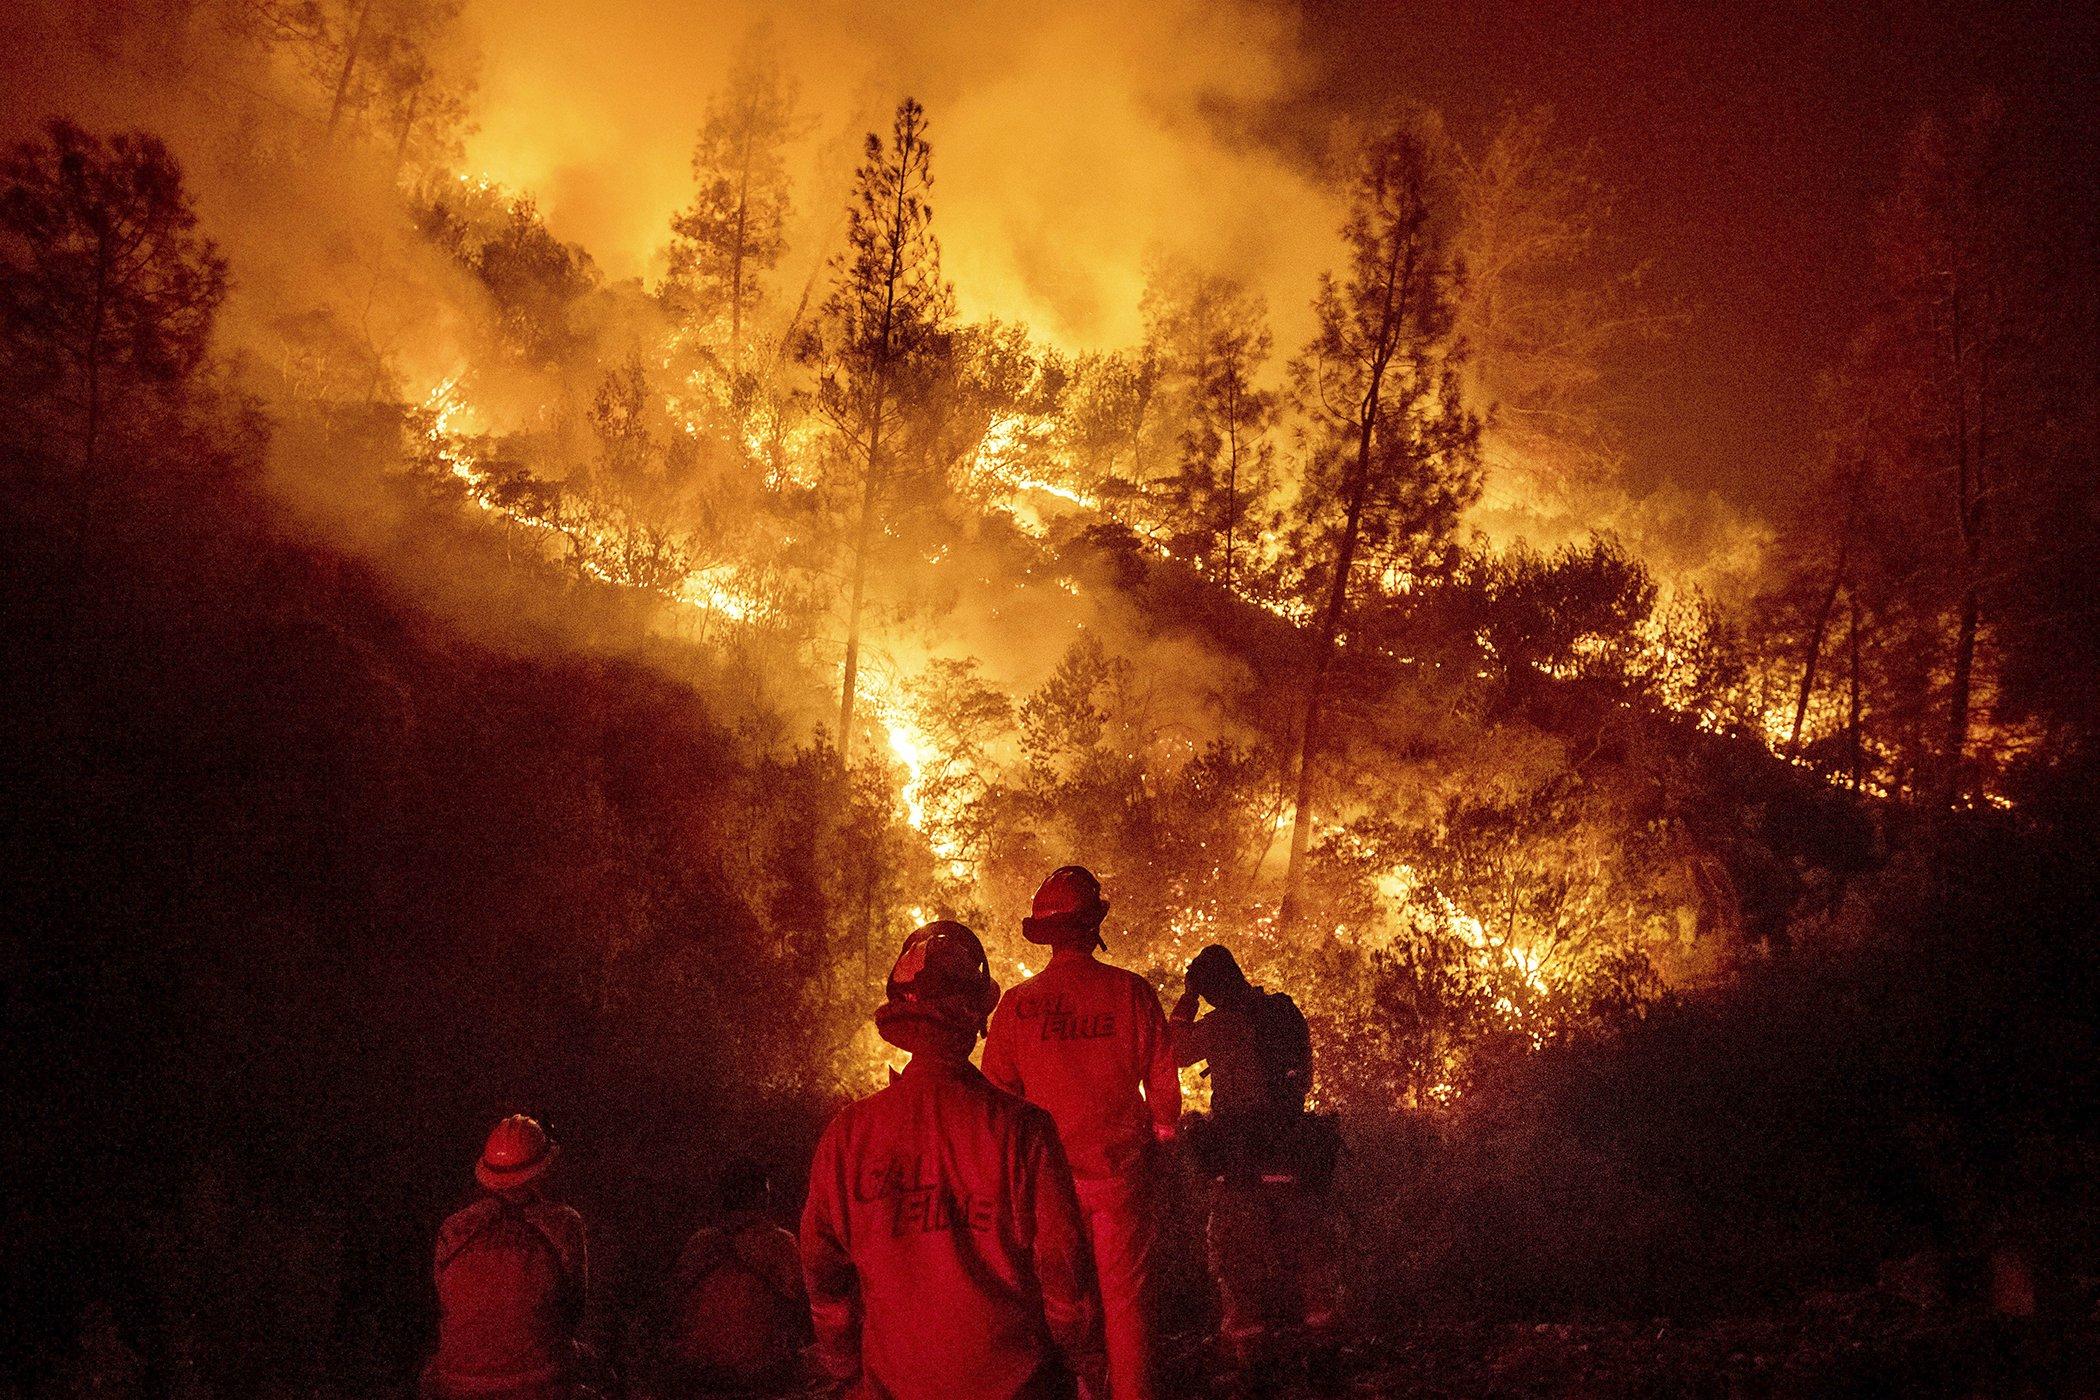 Environmental-Photos-August-California-Wildfires.jpg